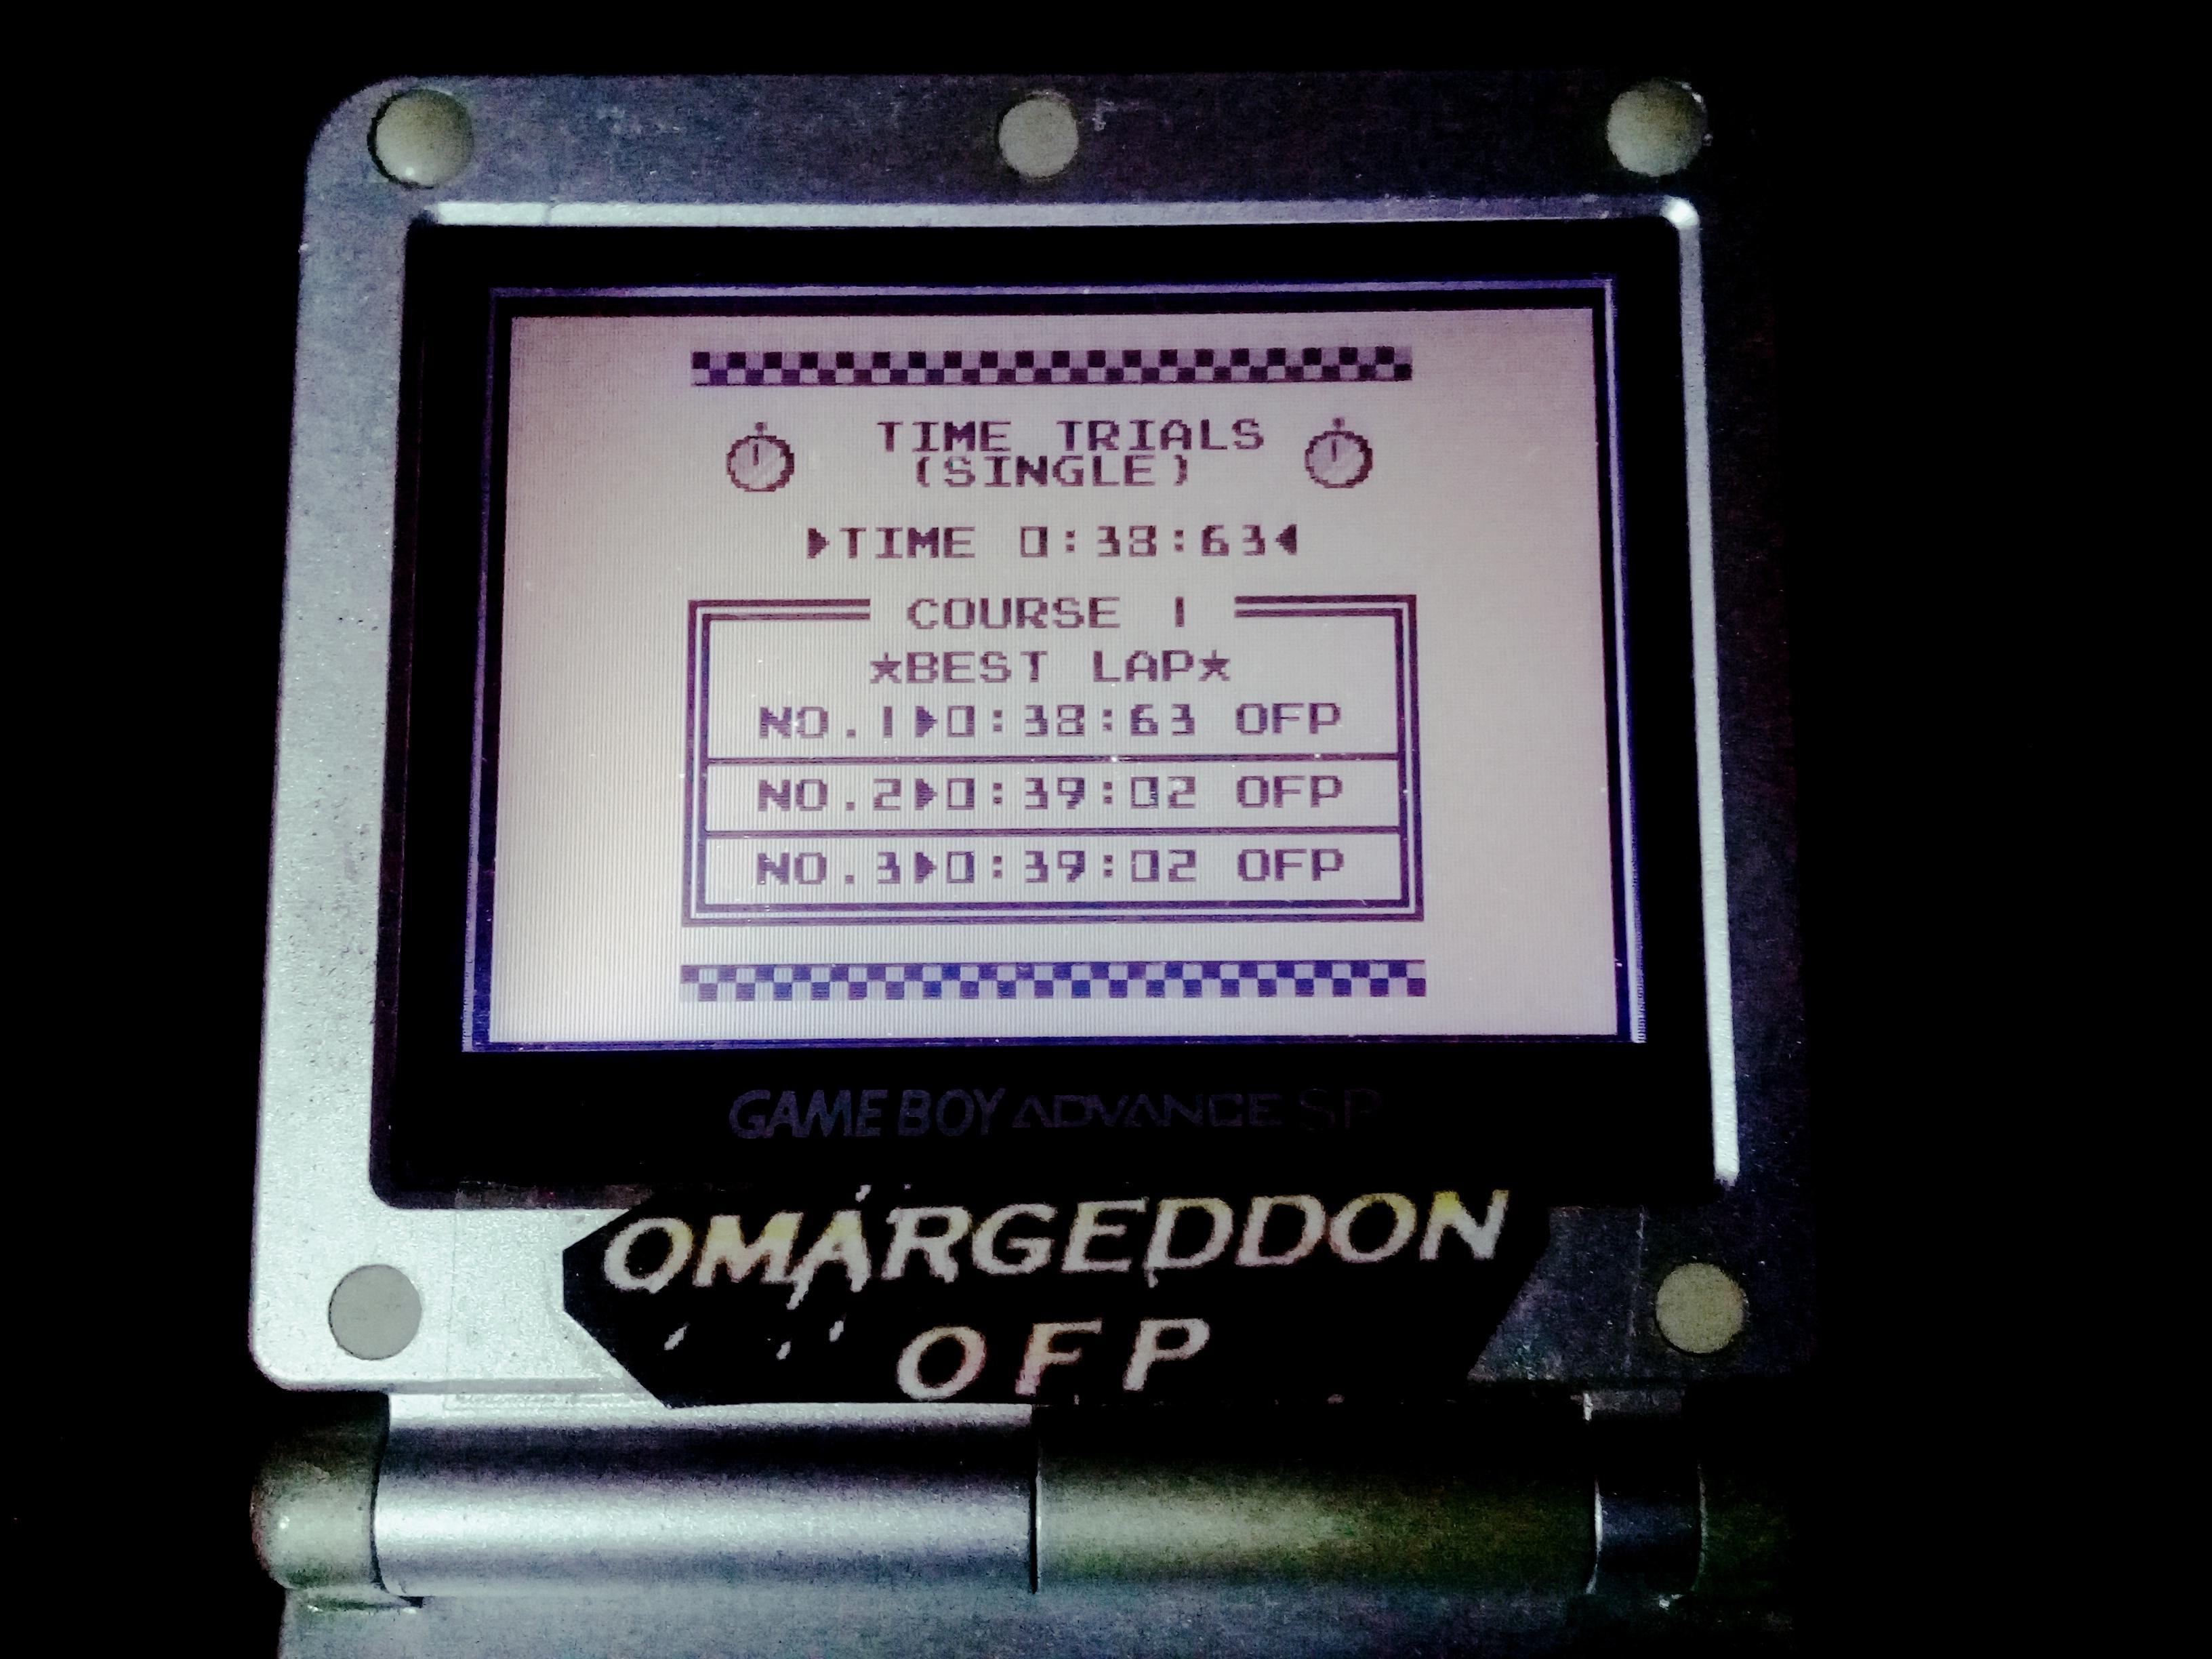 omargeddon: F-1 Race: Time Trials: Single: Australia [Best Lap] (Game Boy) 0:00:38.63 points on 2019-11-17 10:56:19